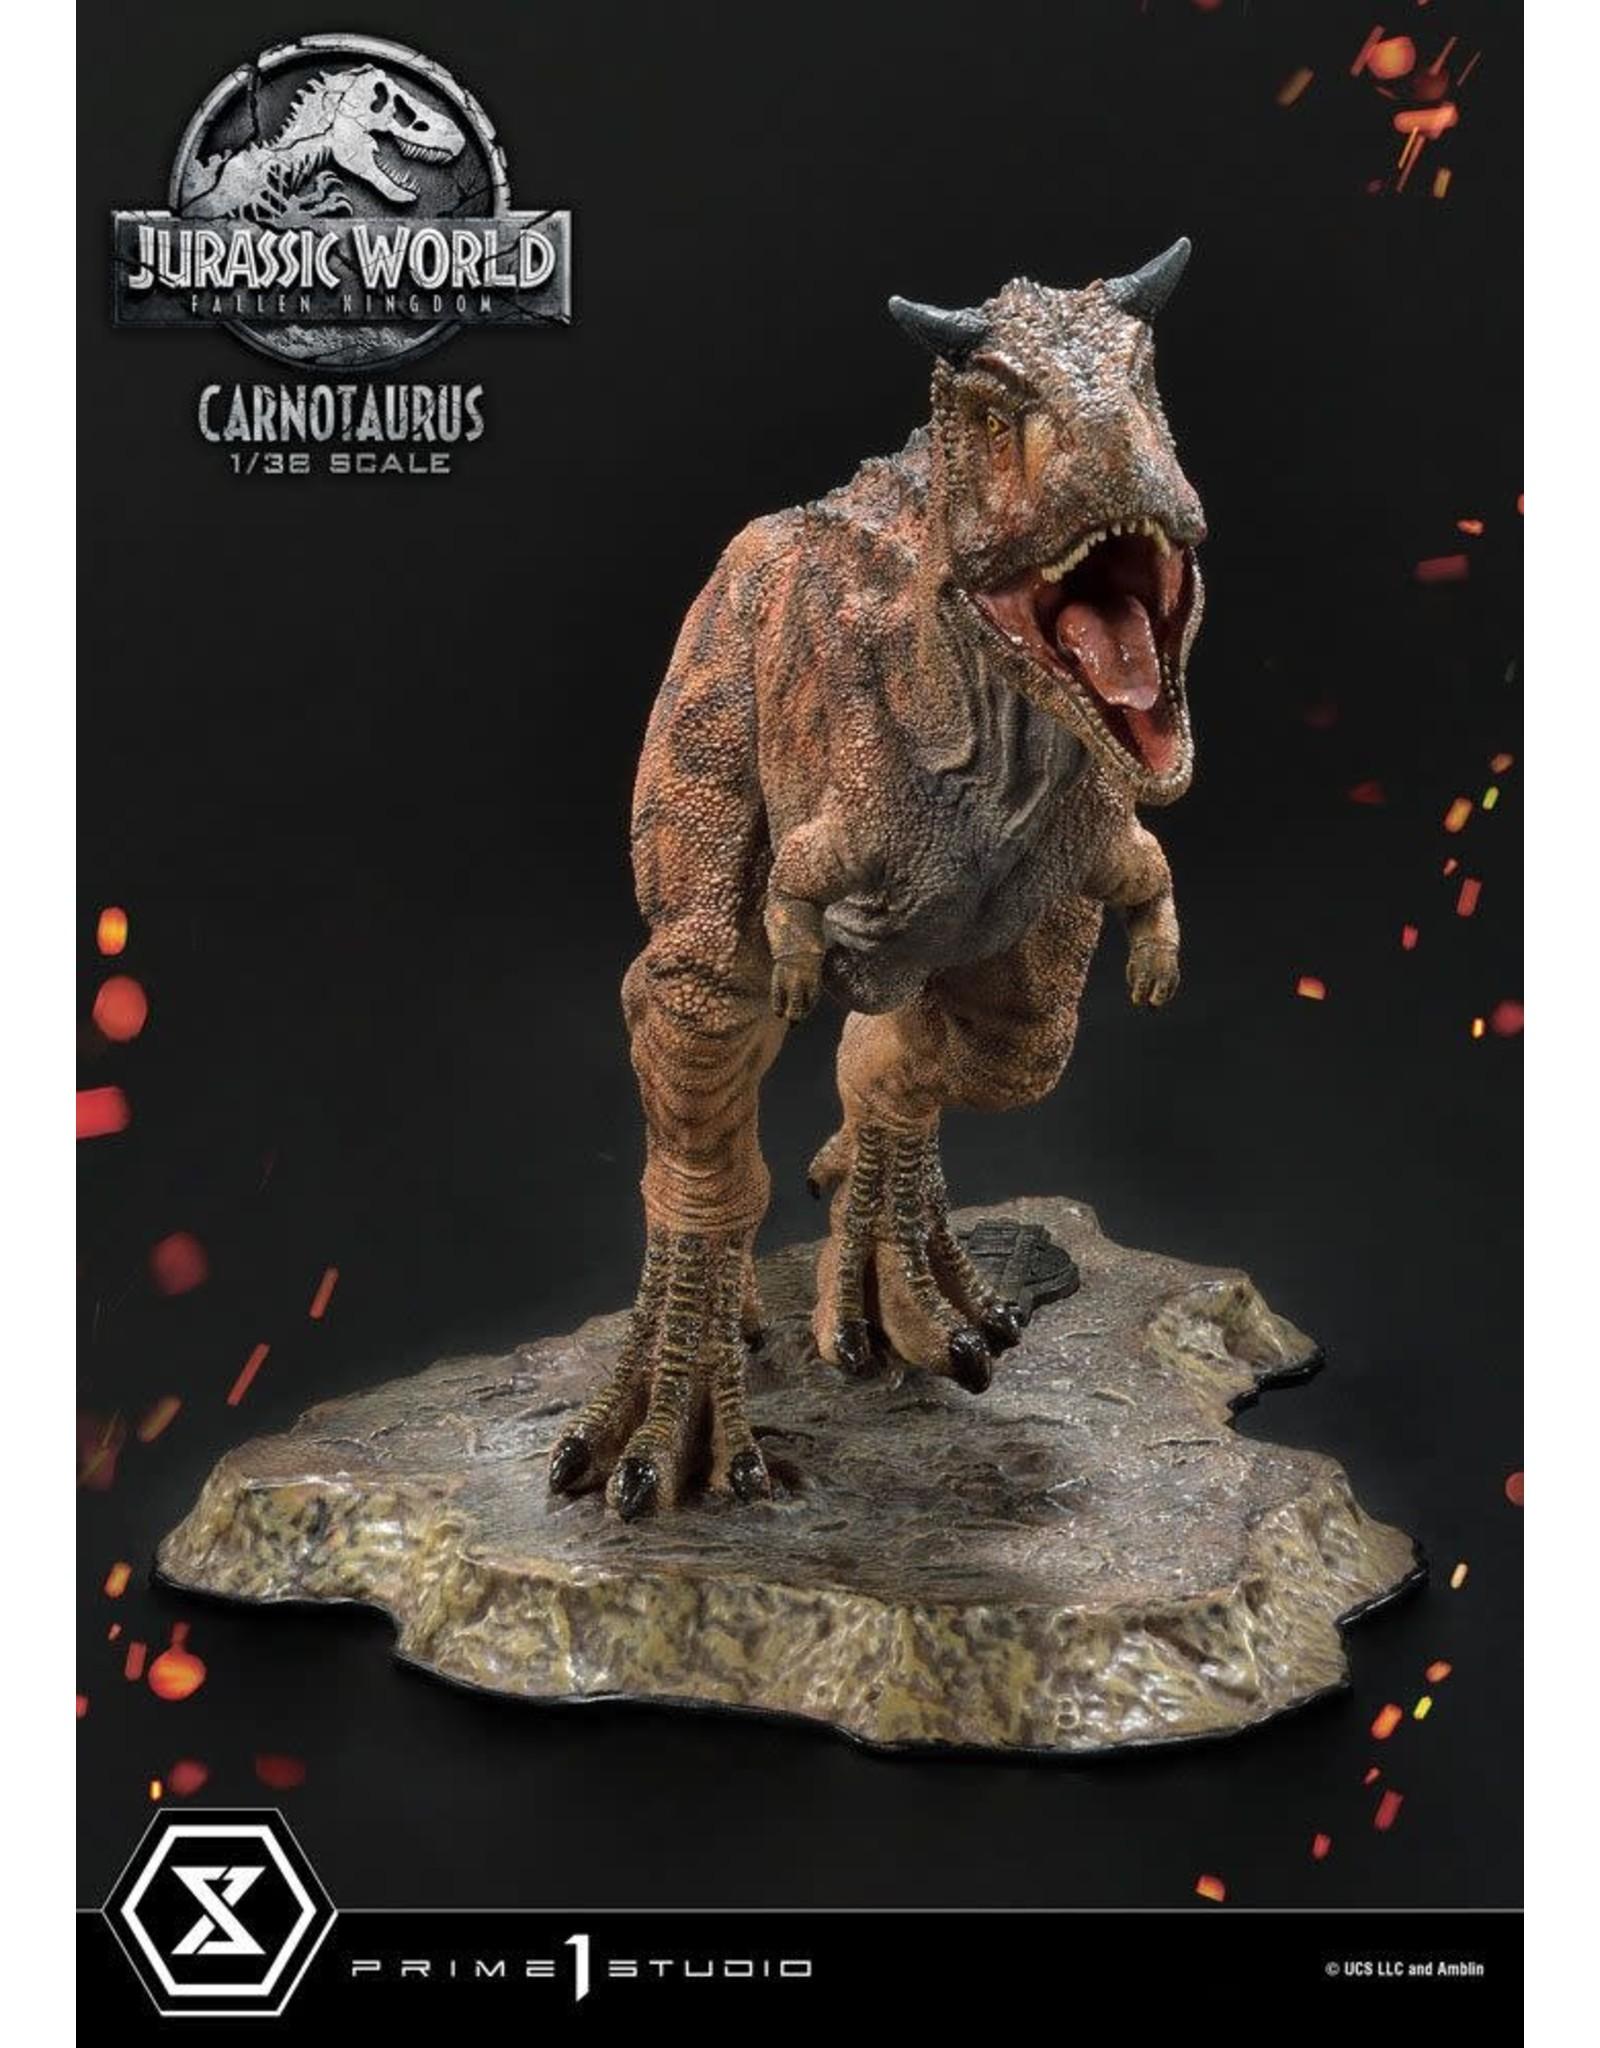 Prime 1 Studio JURASSIC WORLD: Fallen Kingdom Prime Collectibles PVC Statue 1/38 16cm -  Carnotaurus